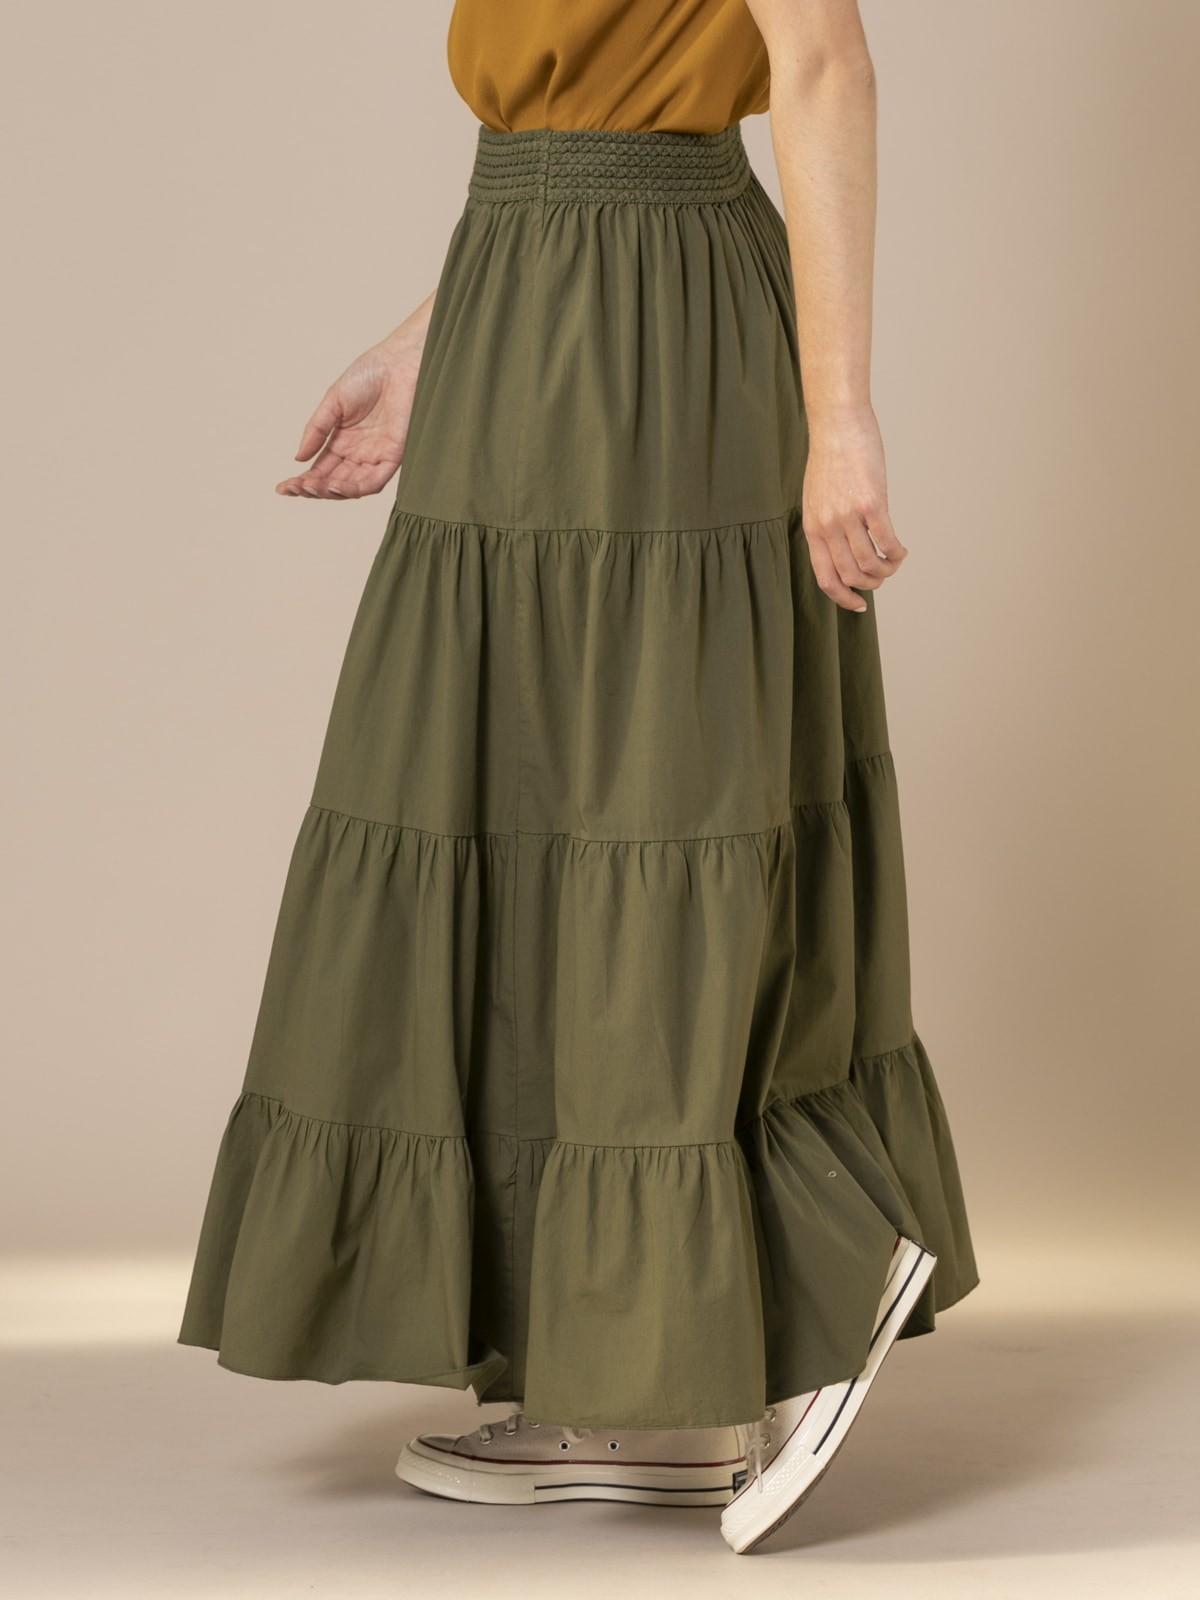 Falda larga cintura elástica Caqui